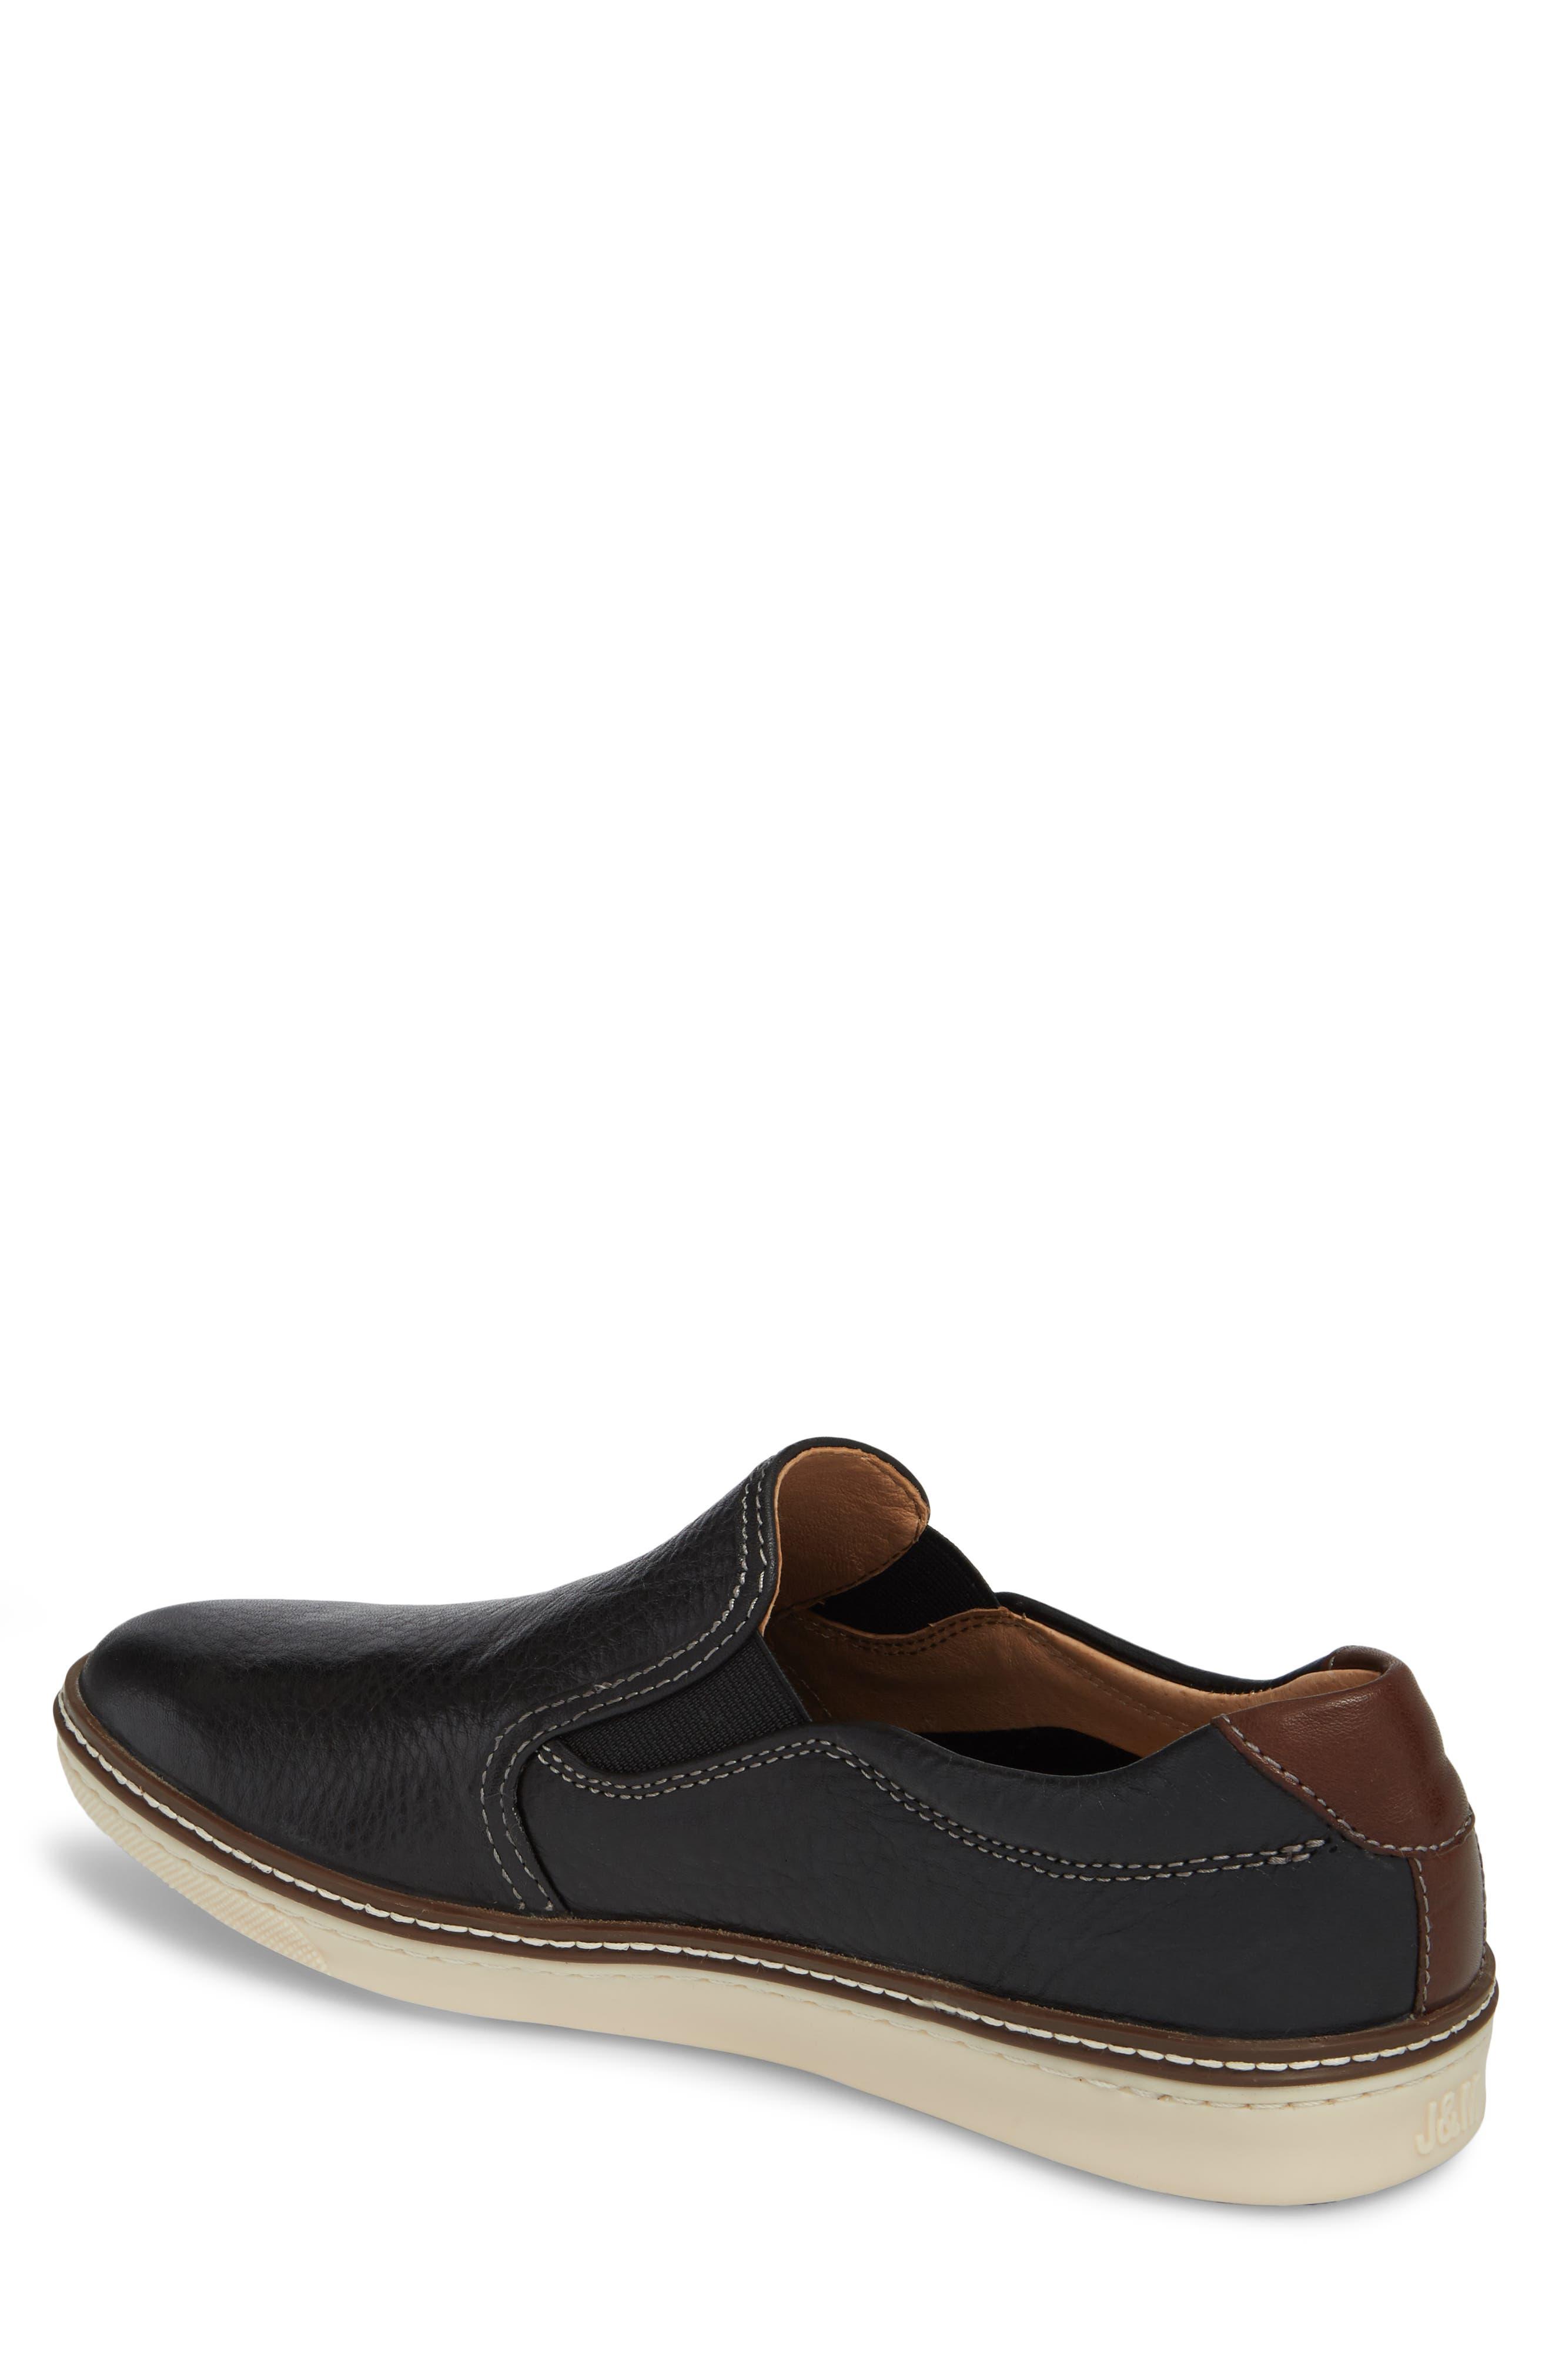 JOHNSTON & MURPHY, McGuffey Slip-On Sneaker, Alternate thumbnail 2, color, BLACK LEATHER